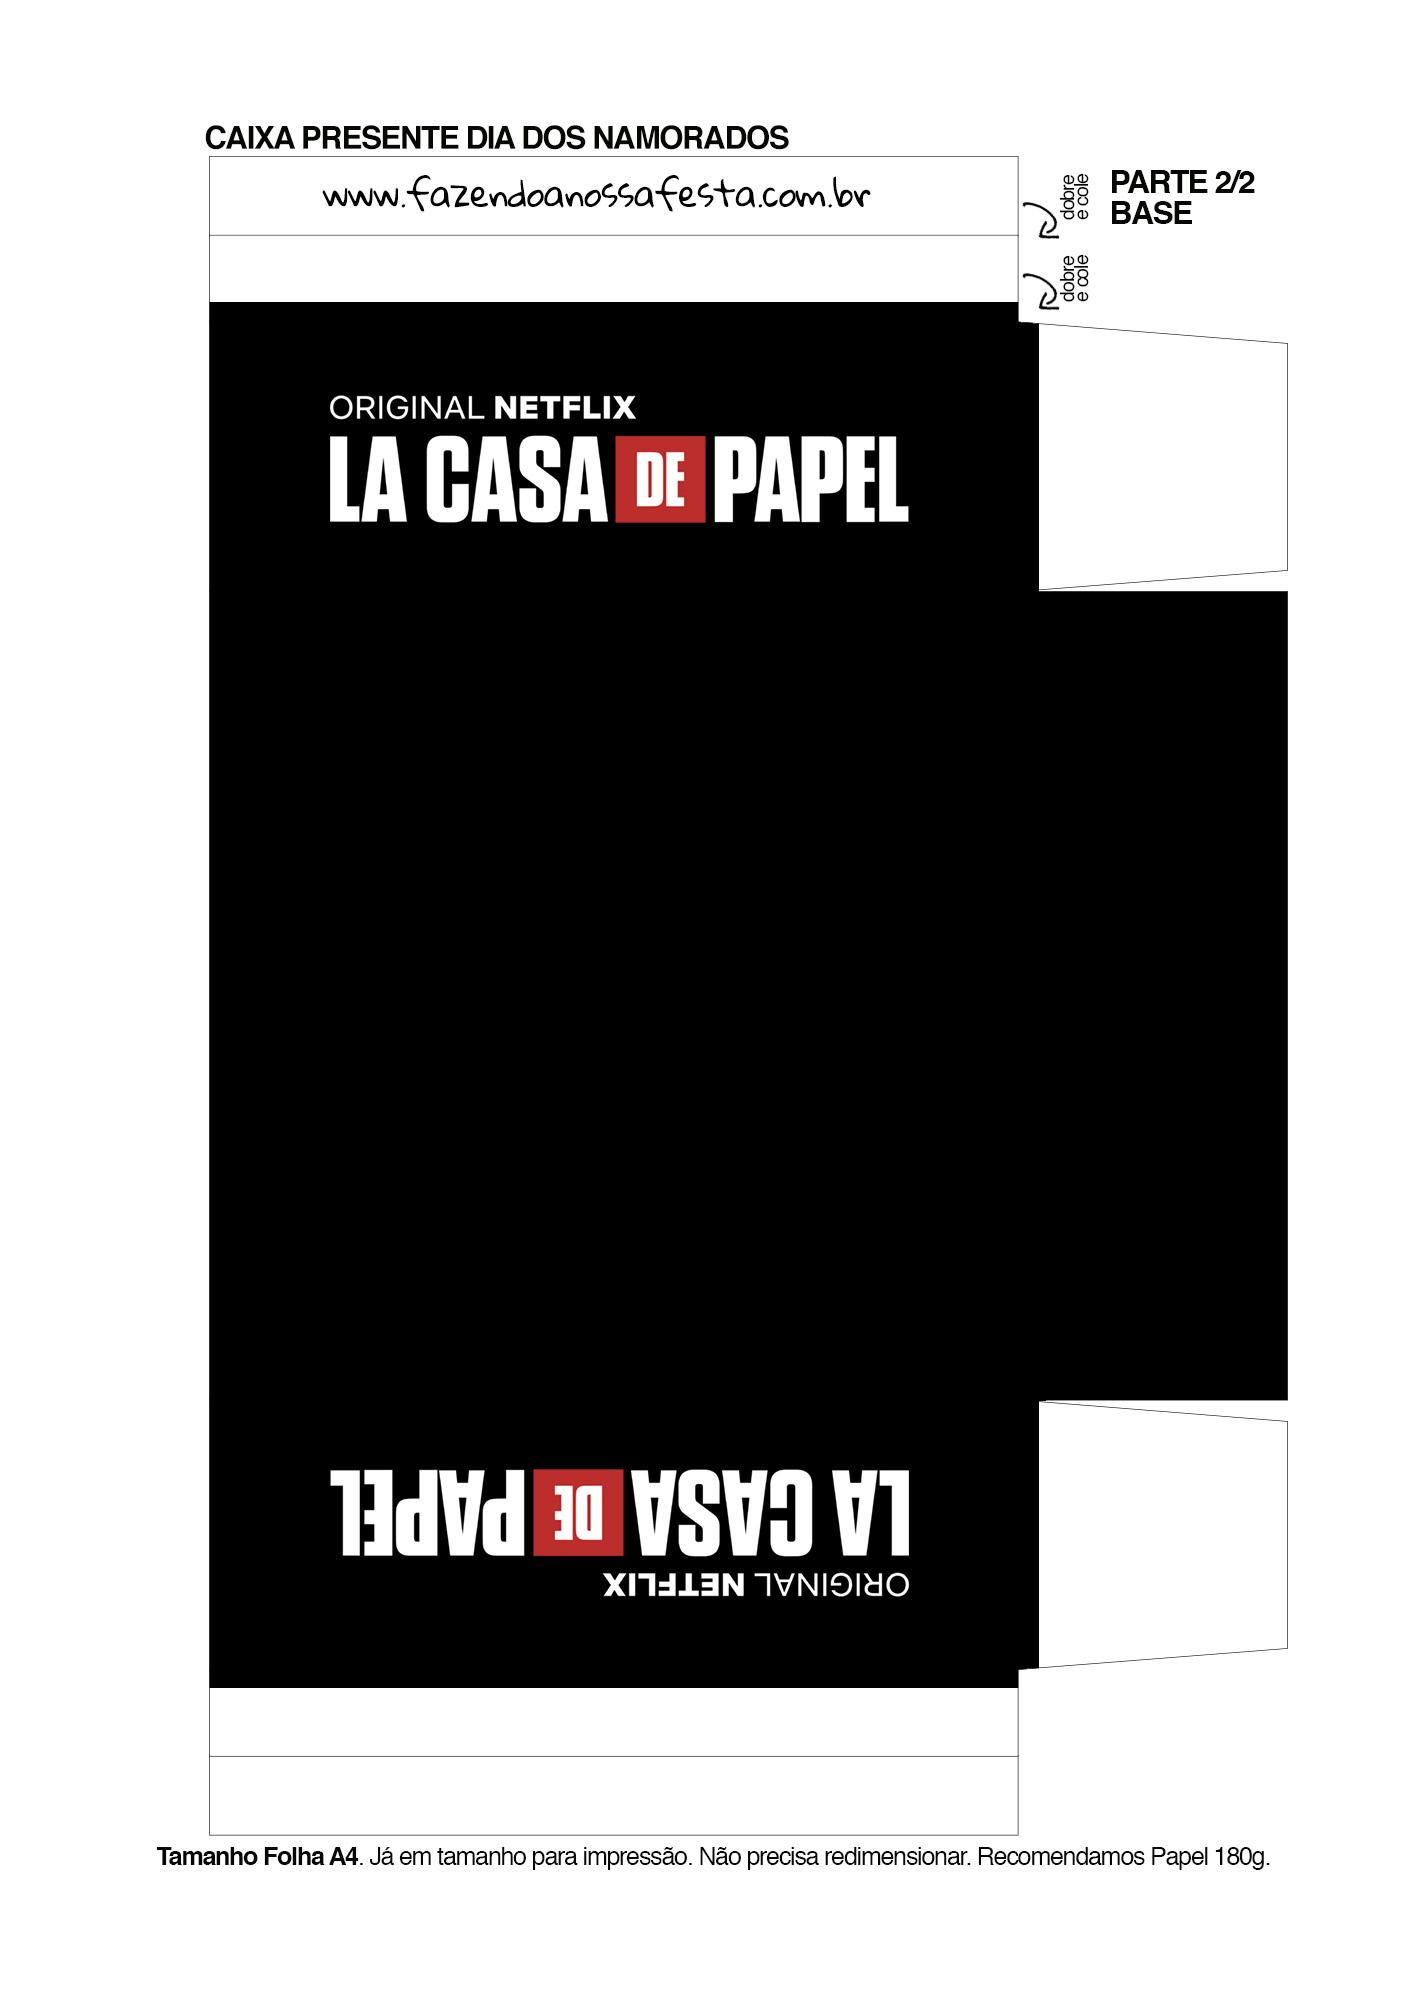 Caixa Brigadeiro La Casa de Papel la casa de papel 1